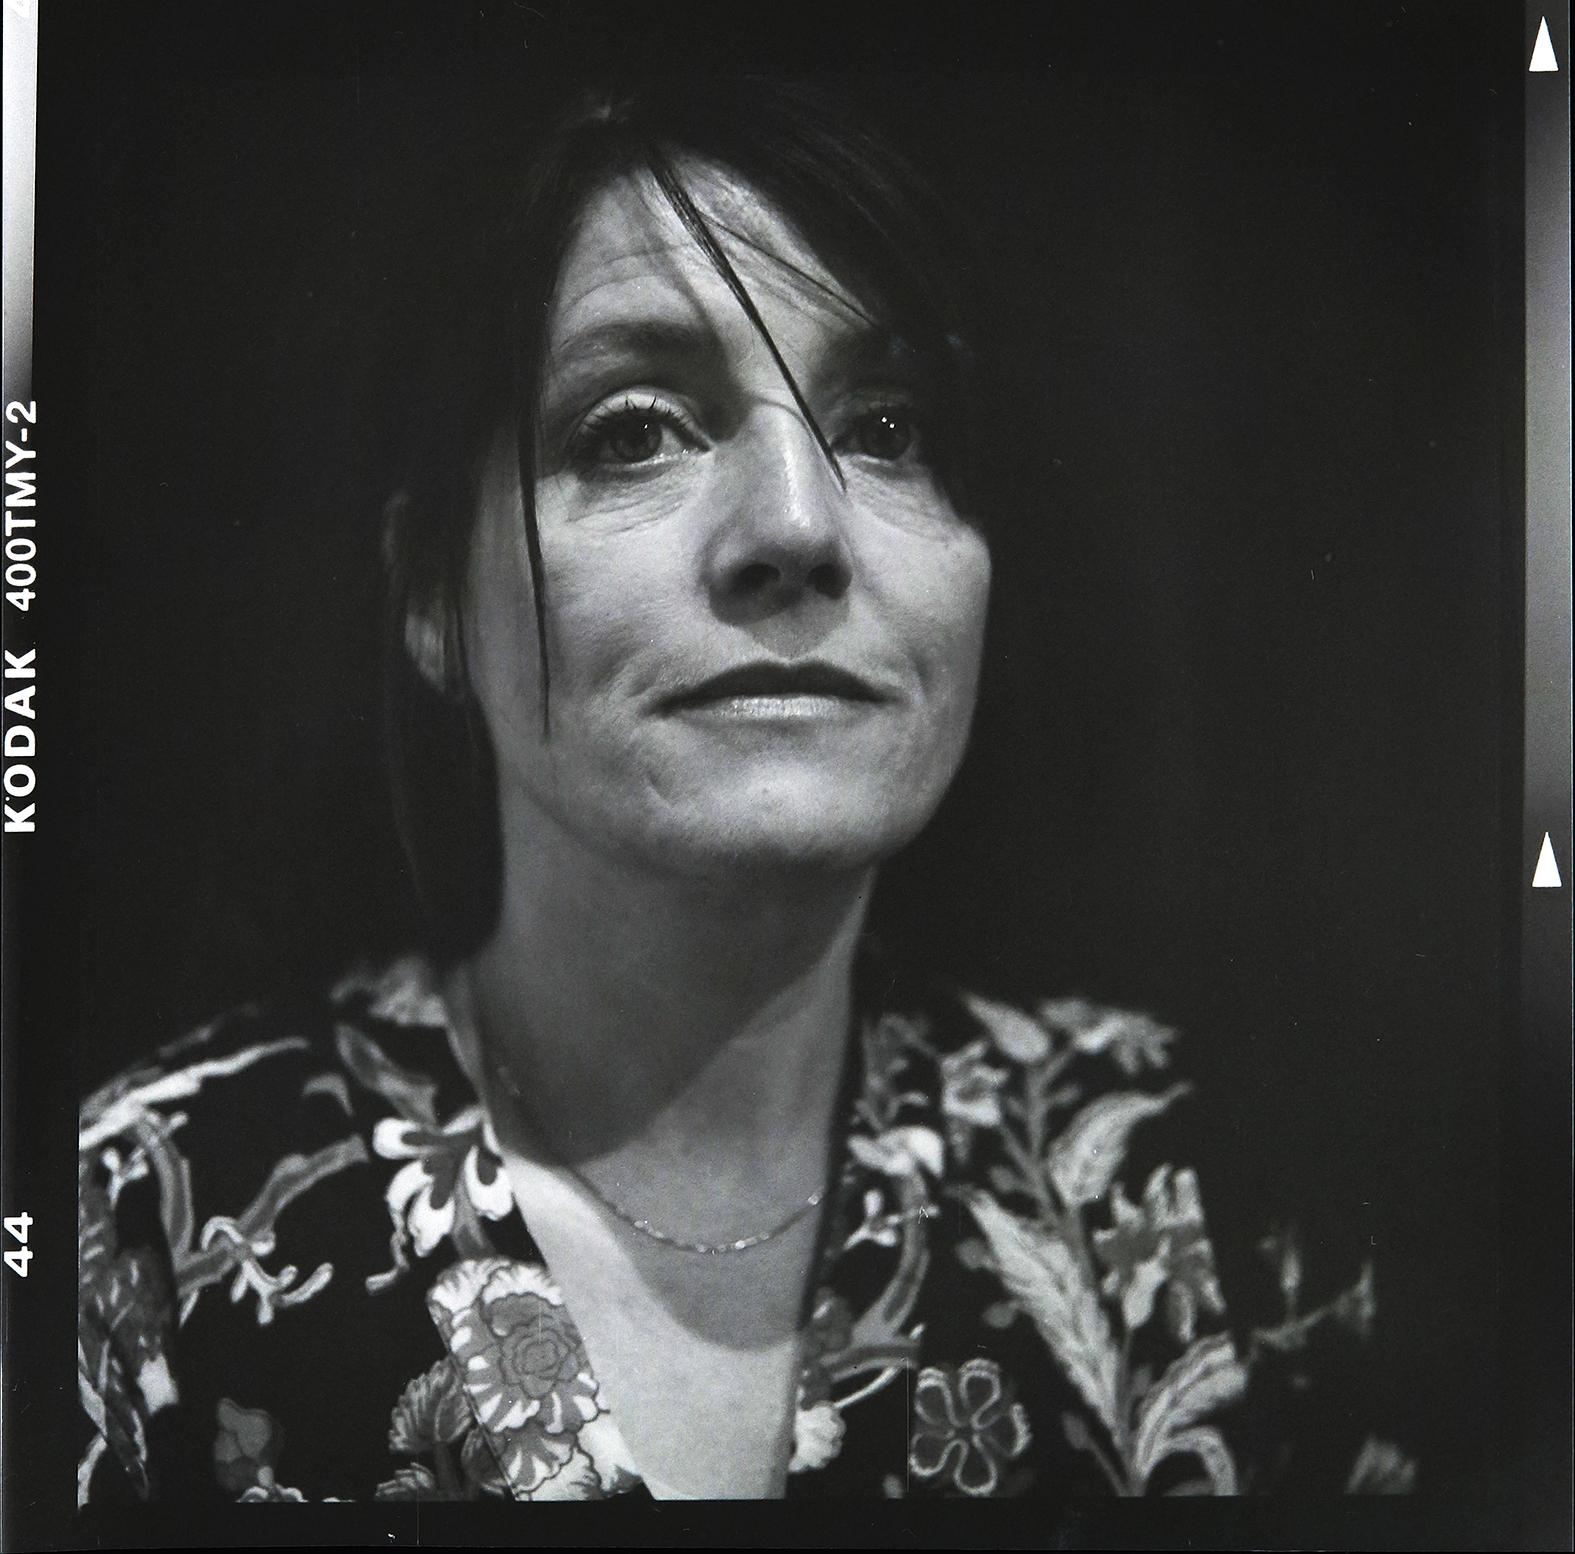 Konstnären Jessica Lundeberg. Foto: Mikael Andersson, 2016-06-09, Hasselblad 500 CM, 150mm, f4-1/30 sek.